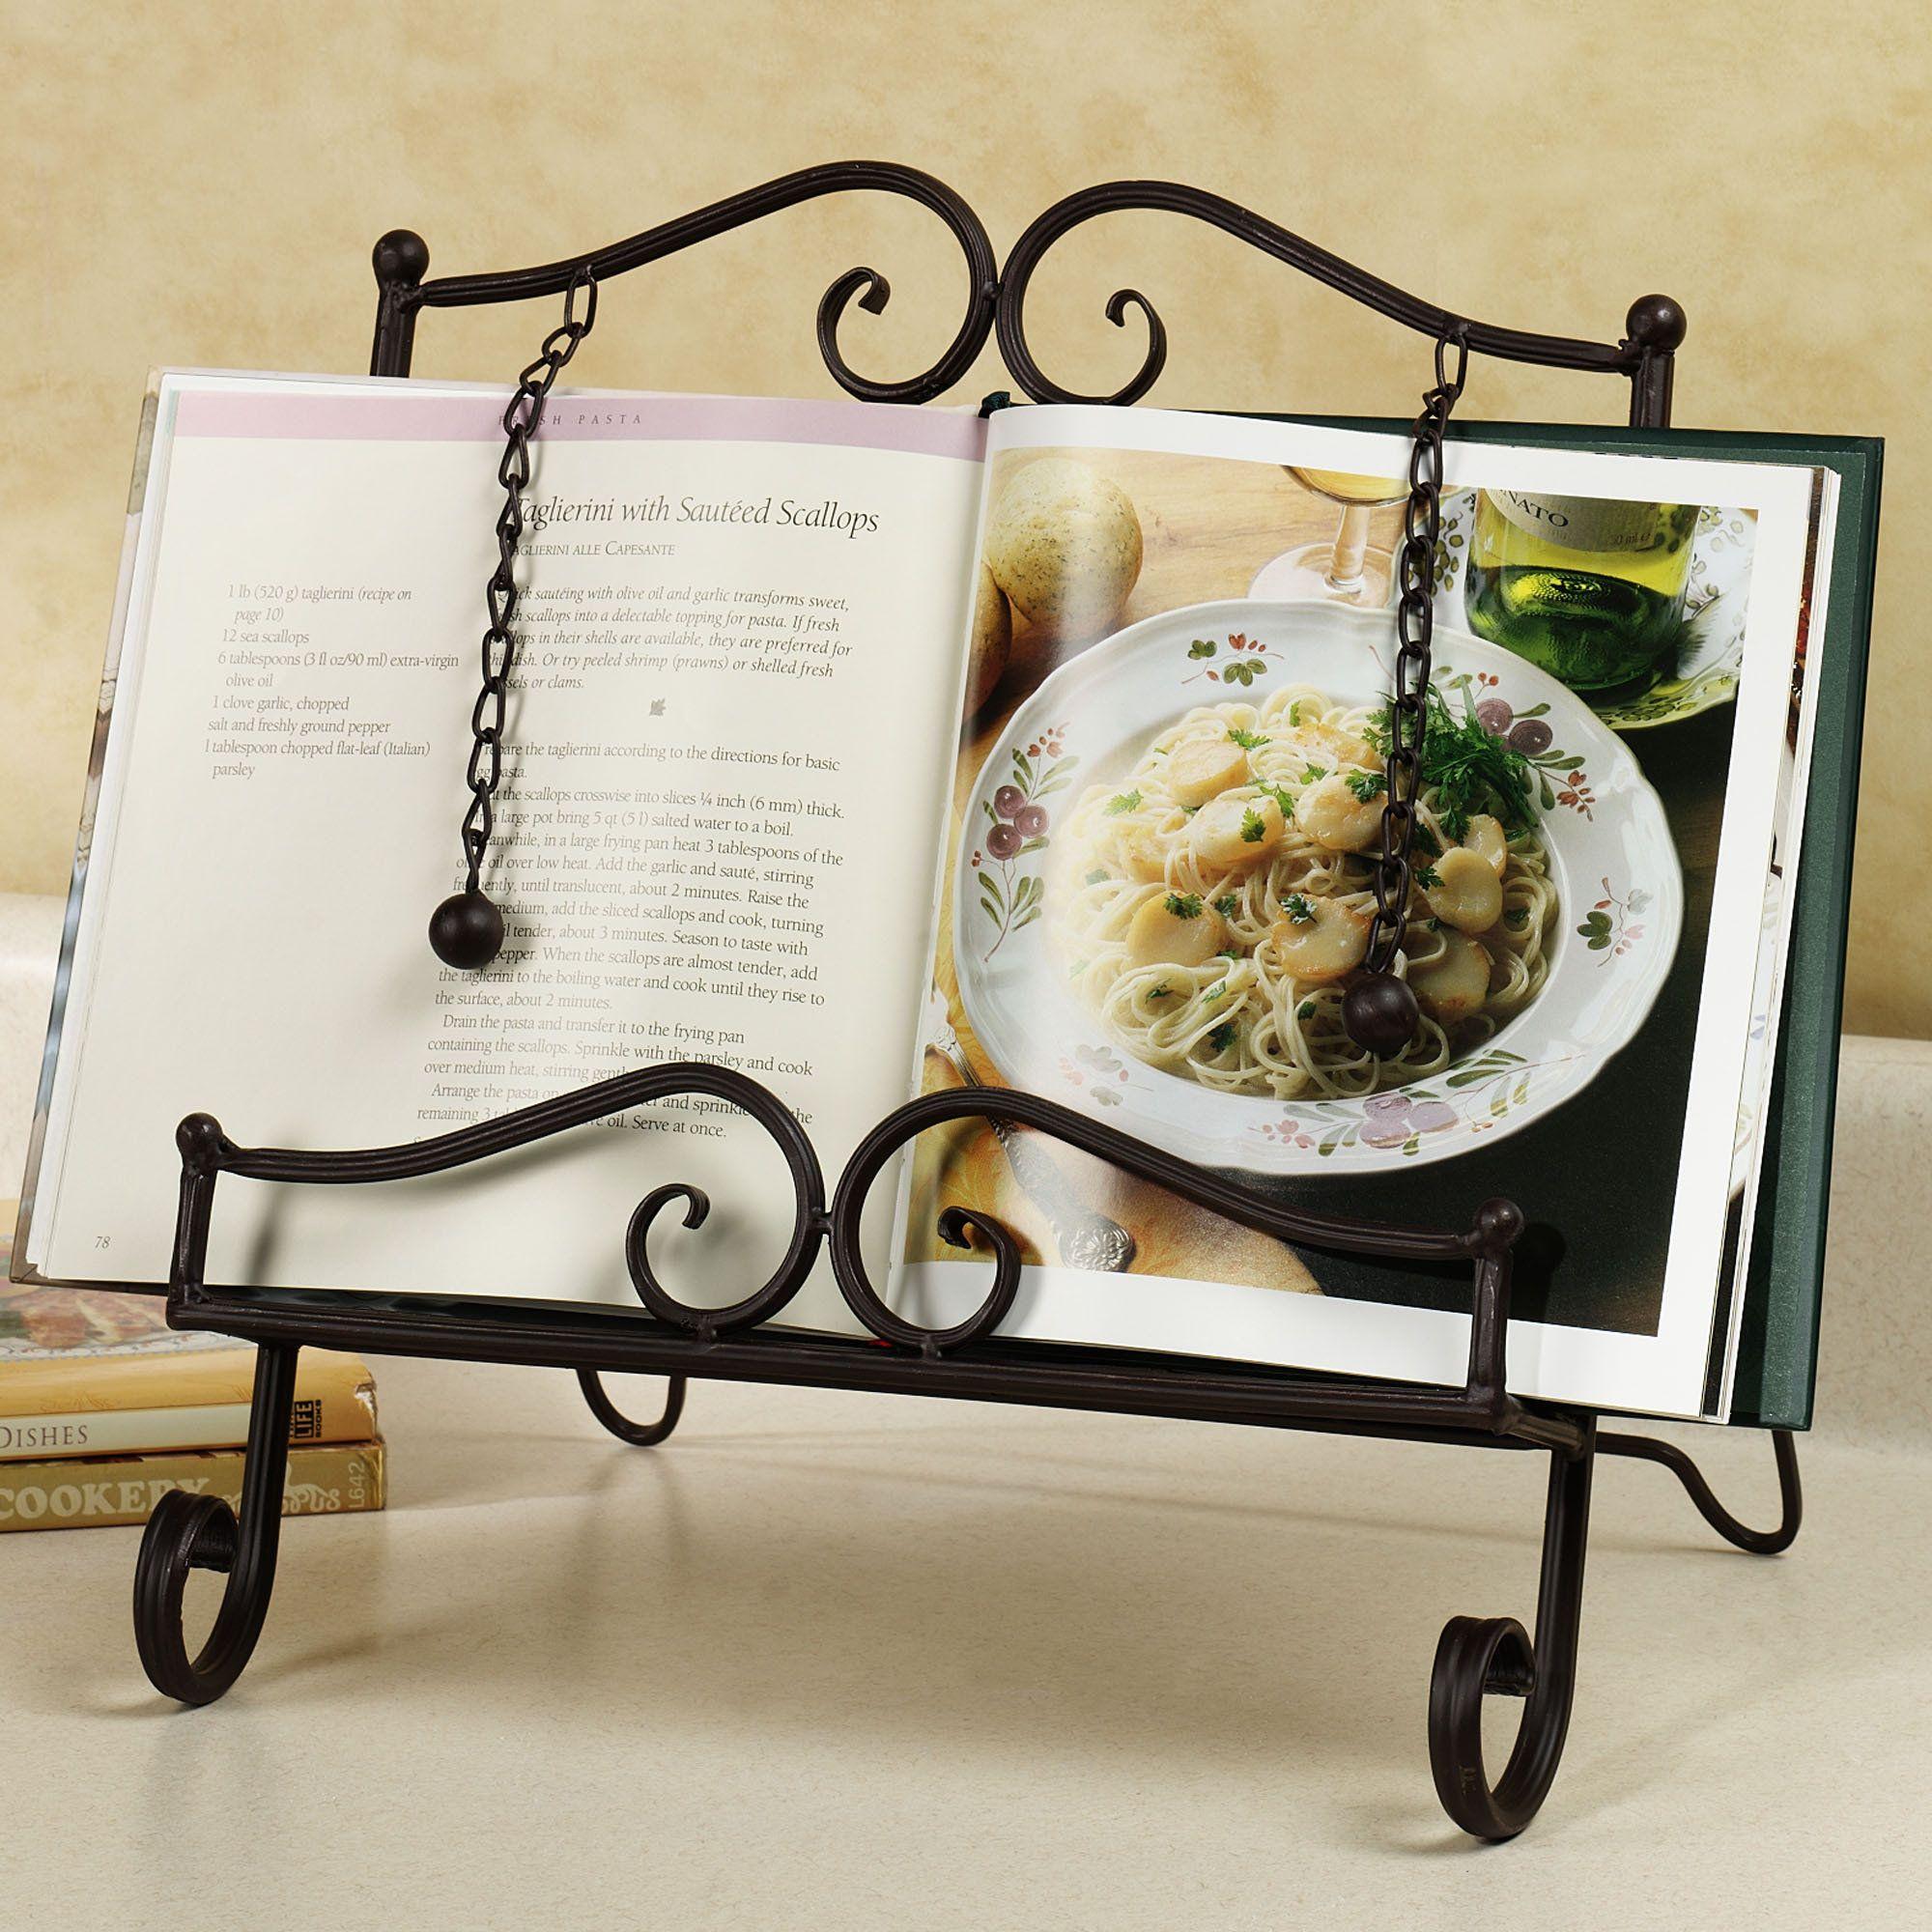 Townsend Cookbook Stand Cook Book Stand Wrought Iron Garden Furniture Iron Decor